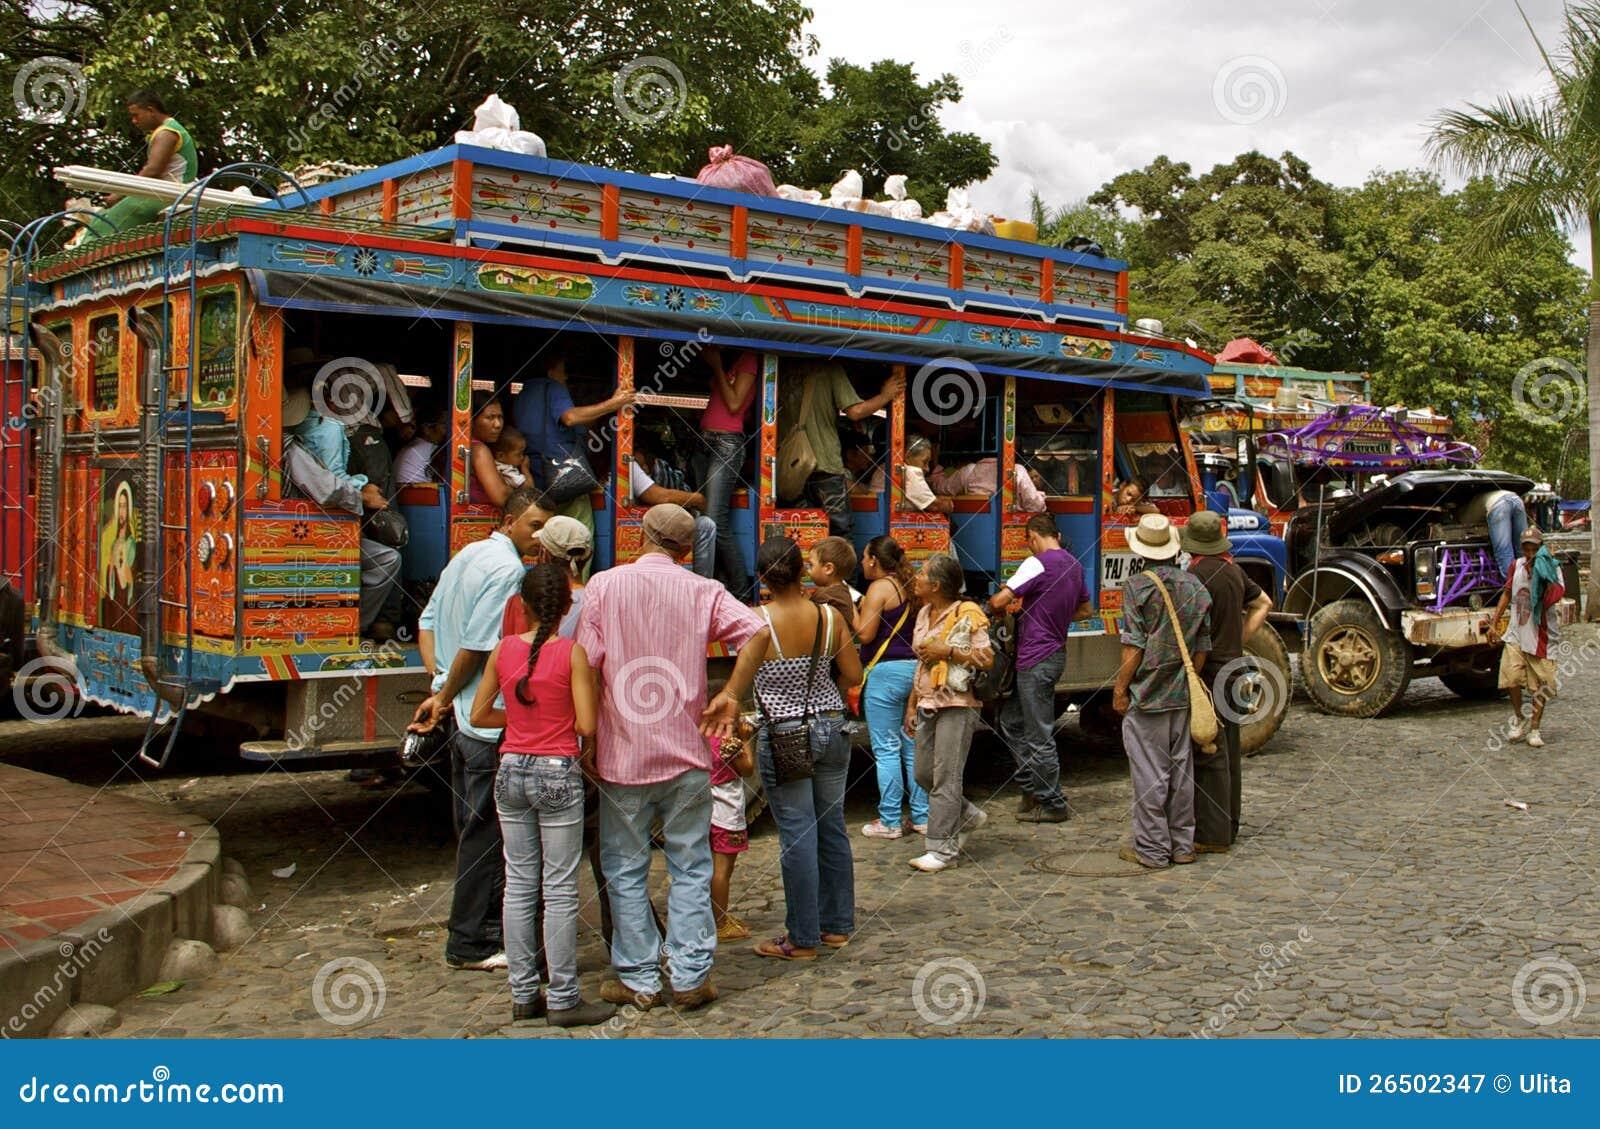 Transport en commun, bus de Chiva, Colombie